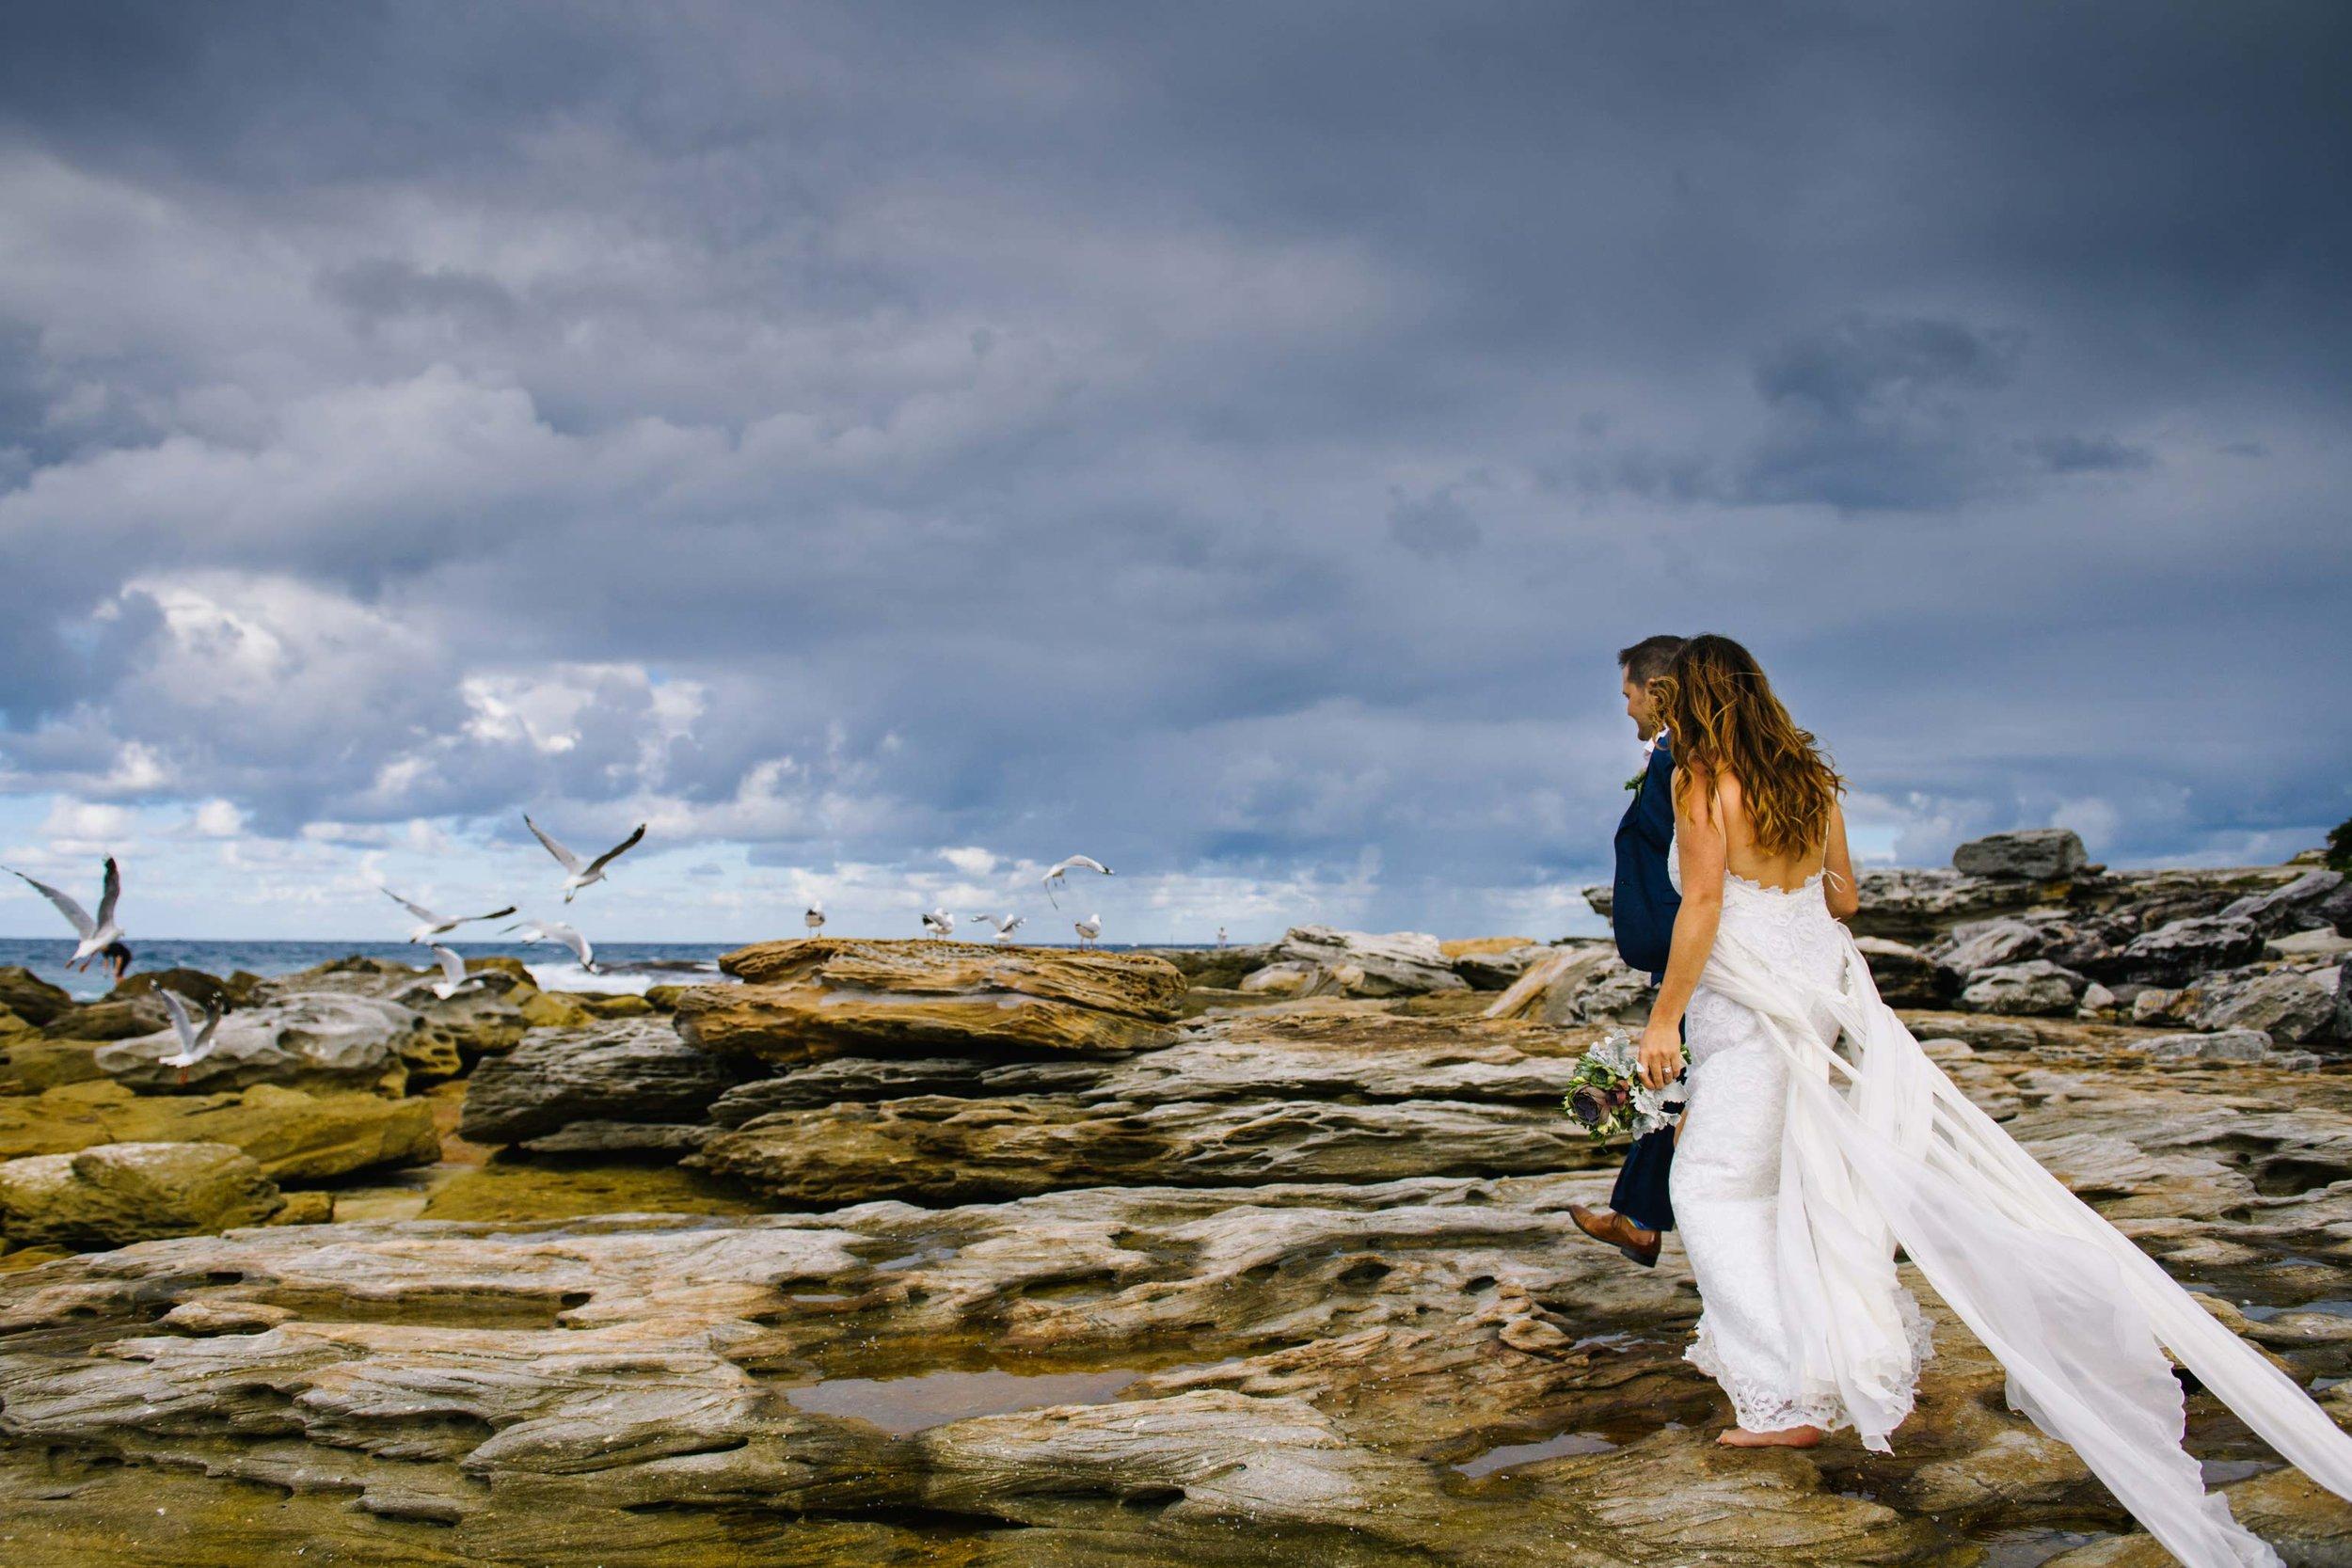 Newlyweds walk along rocky outcrops at Little Bay